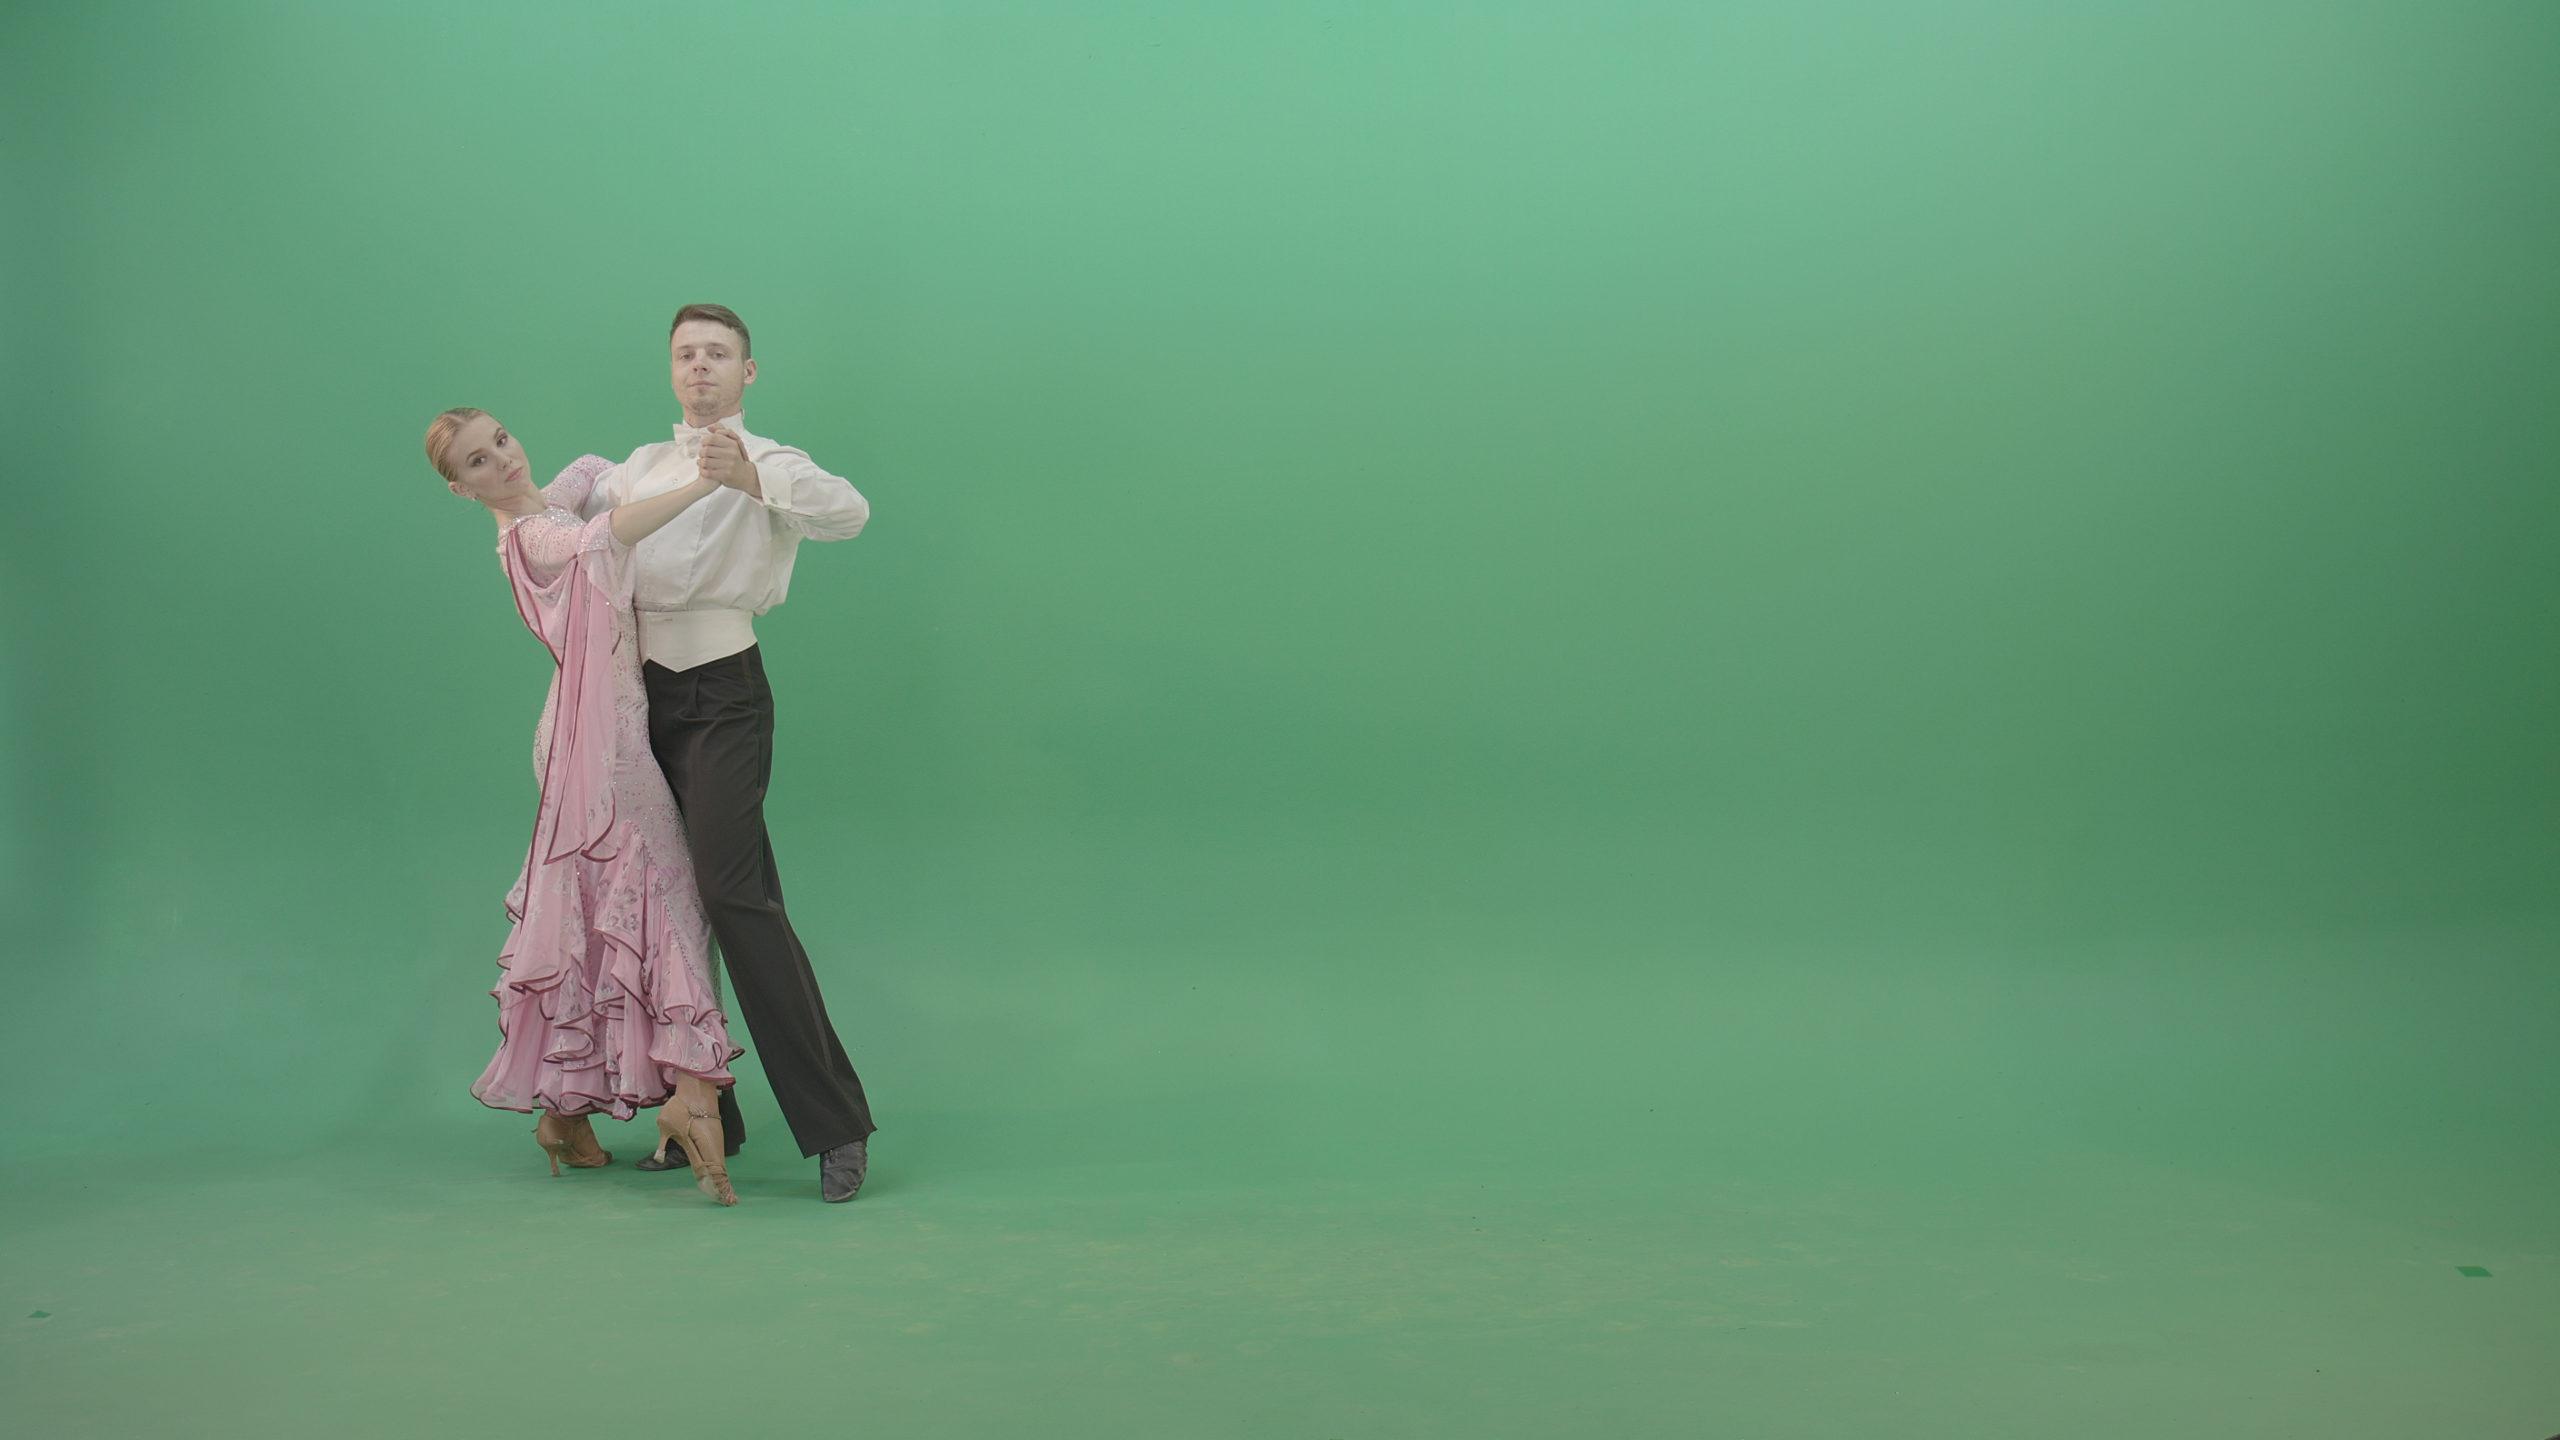 ballroom dance green screen footage stock footage